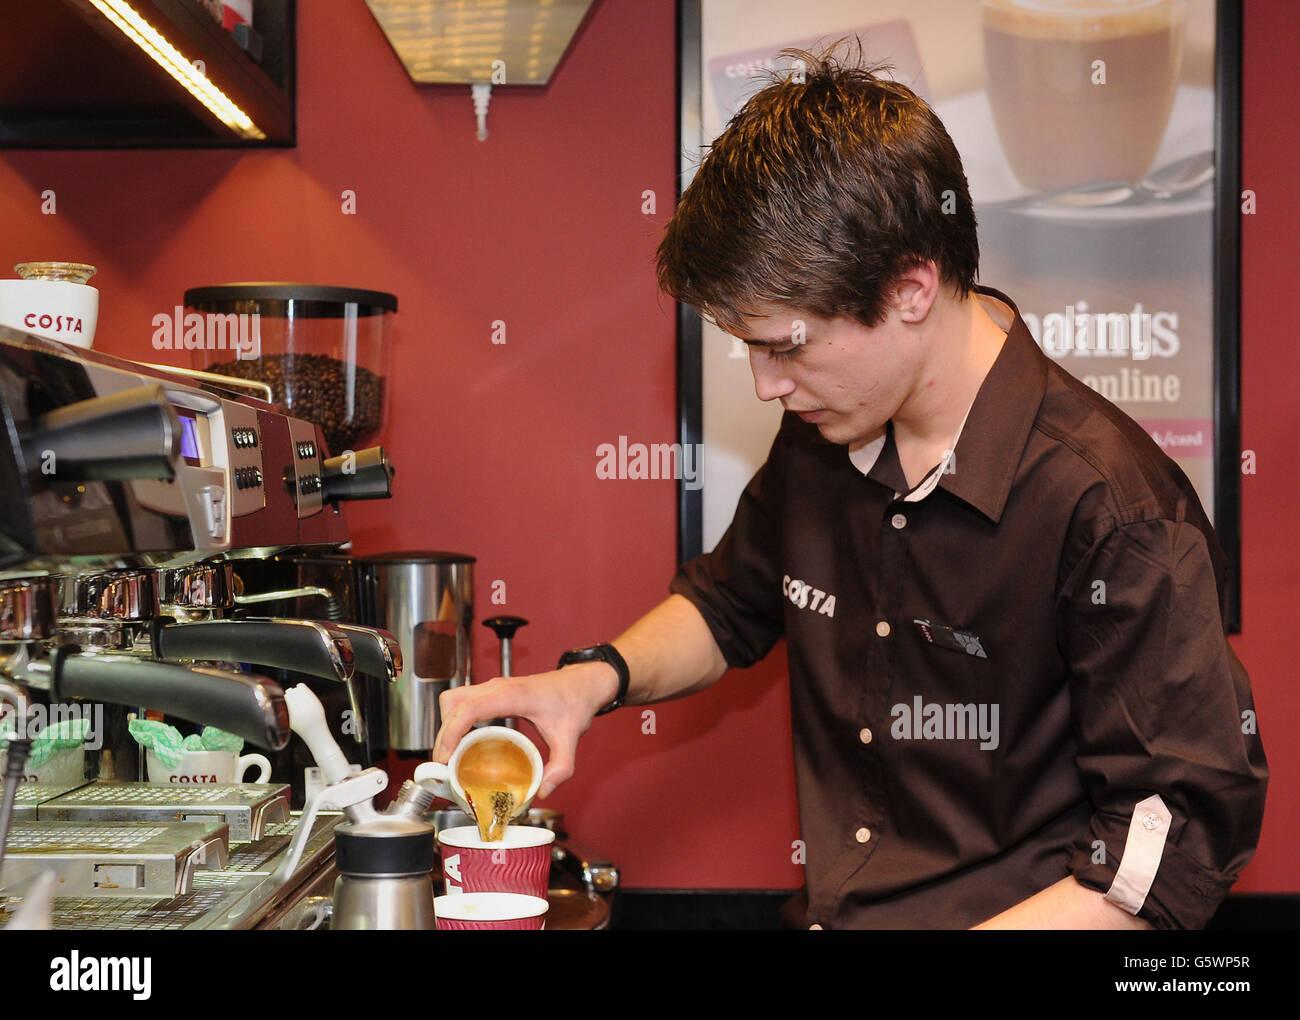 Costa Coffee Jobs Stock Photo 106901699 Alamy